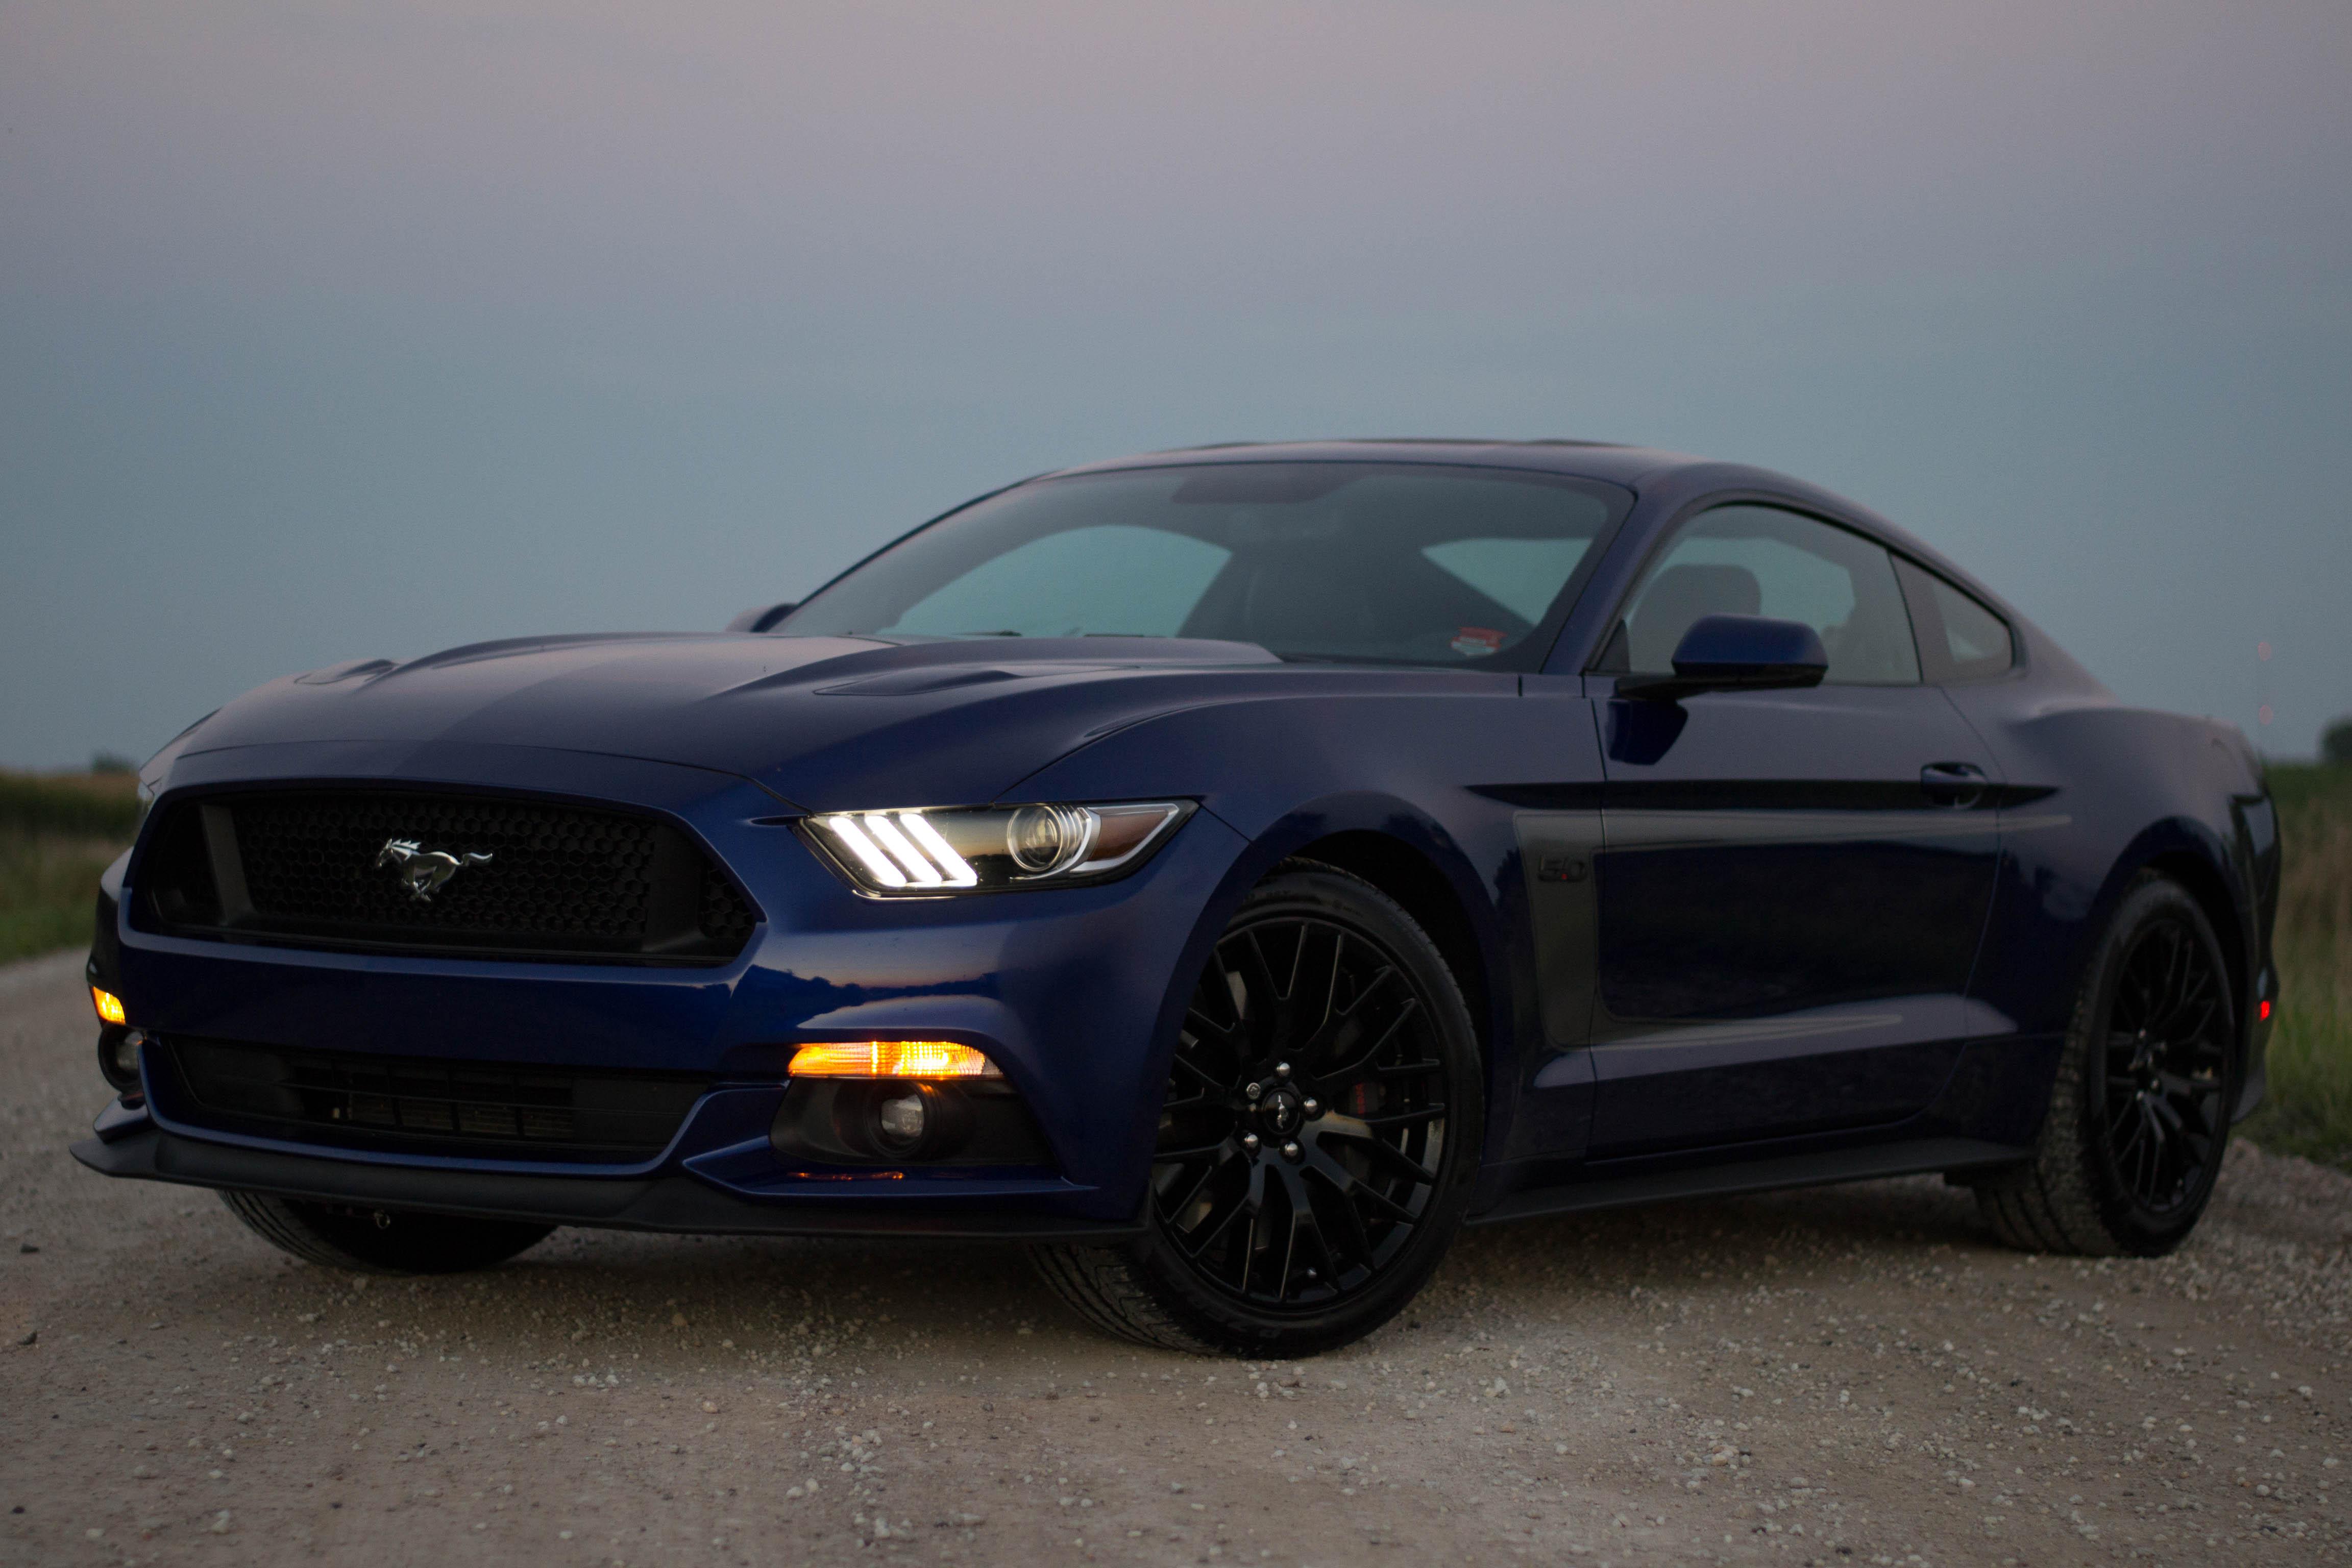 For Sale 2016 Mustang Premium Gt 5 0 Loaded Mustang